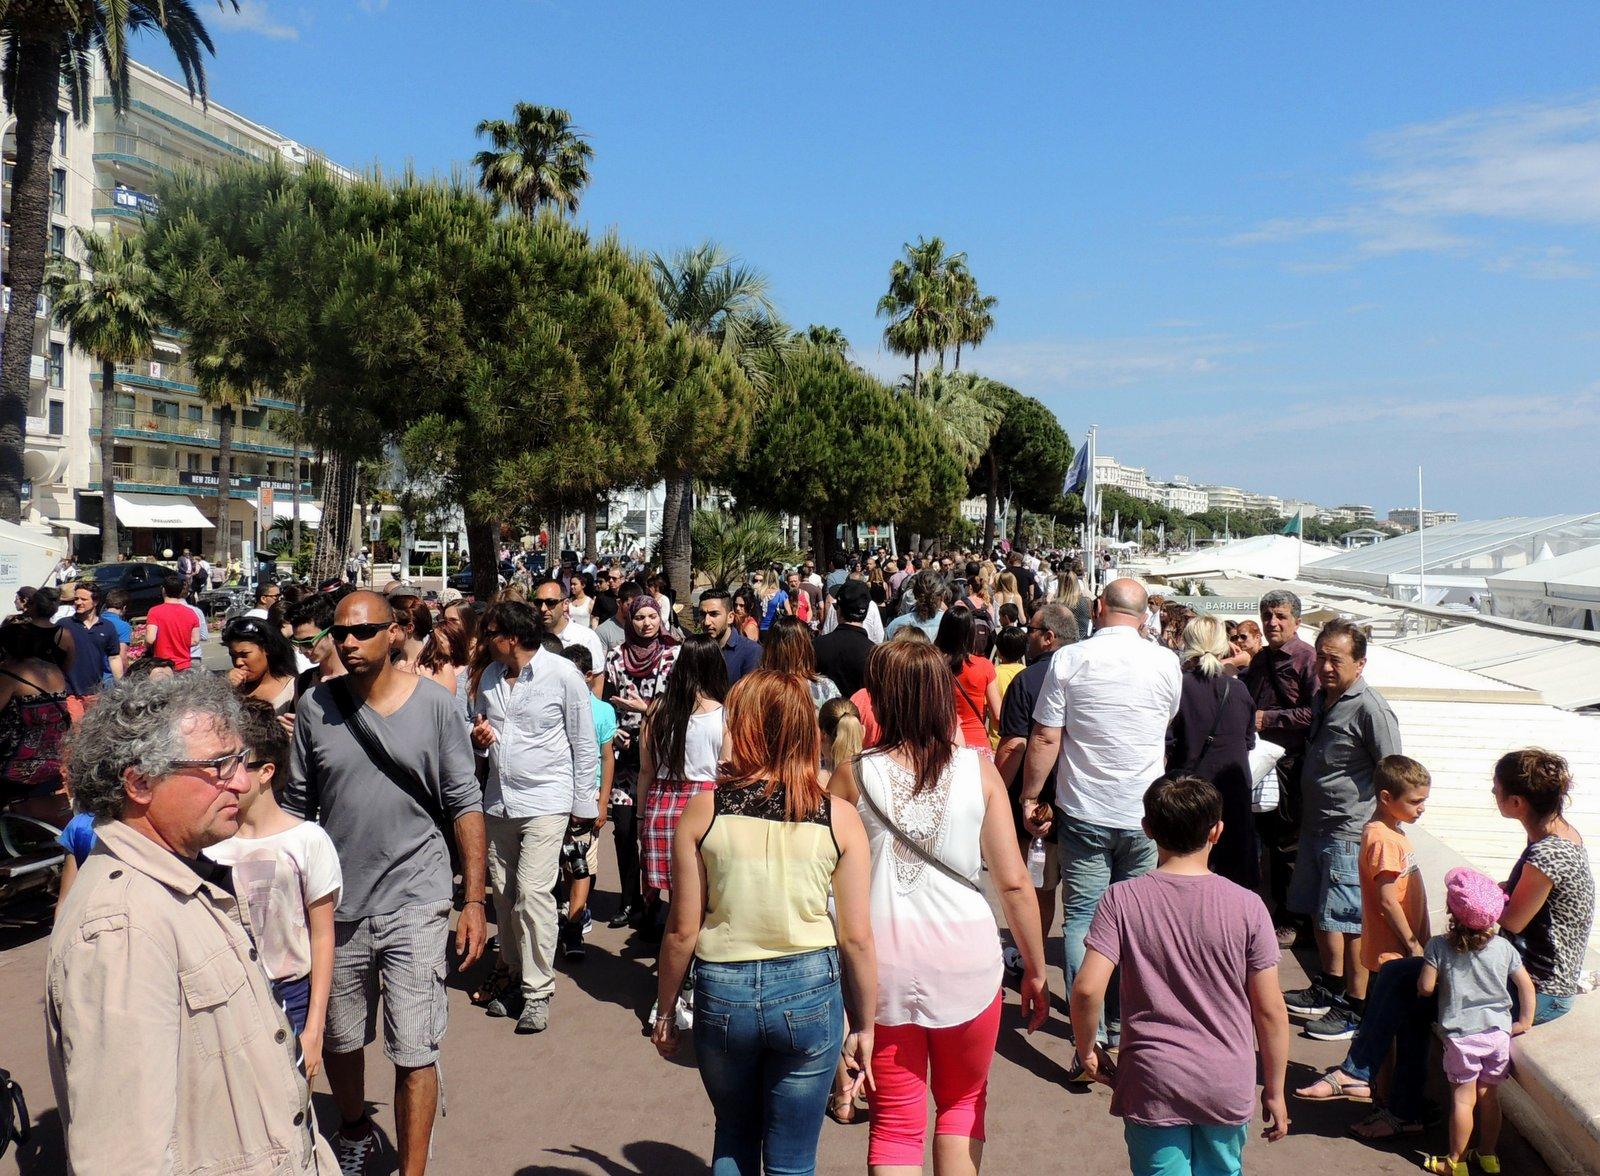 Corniche von Cannes - Côte d`Azur